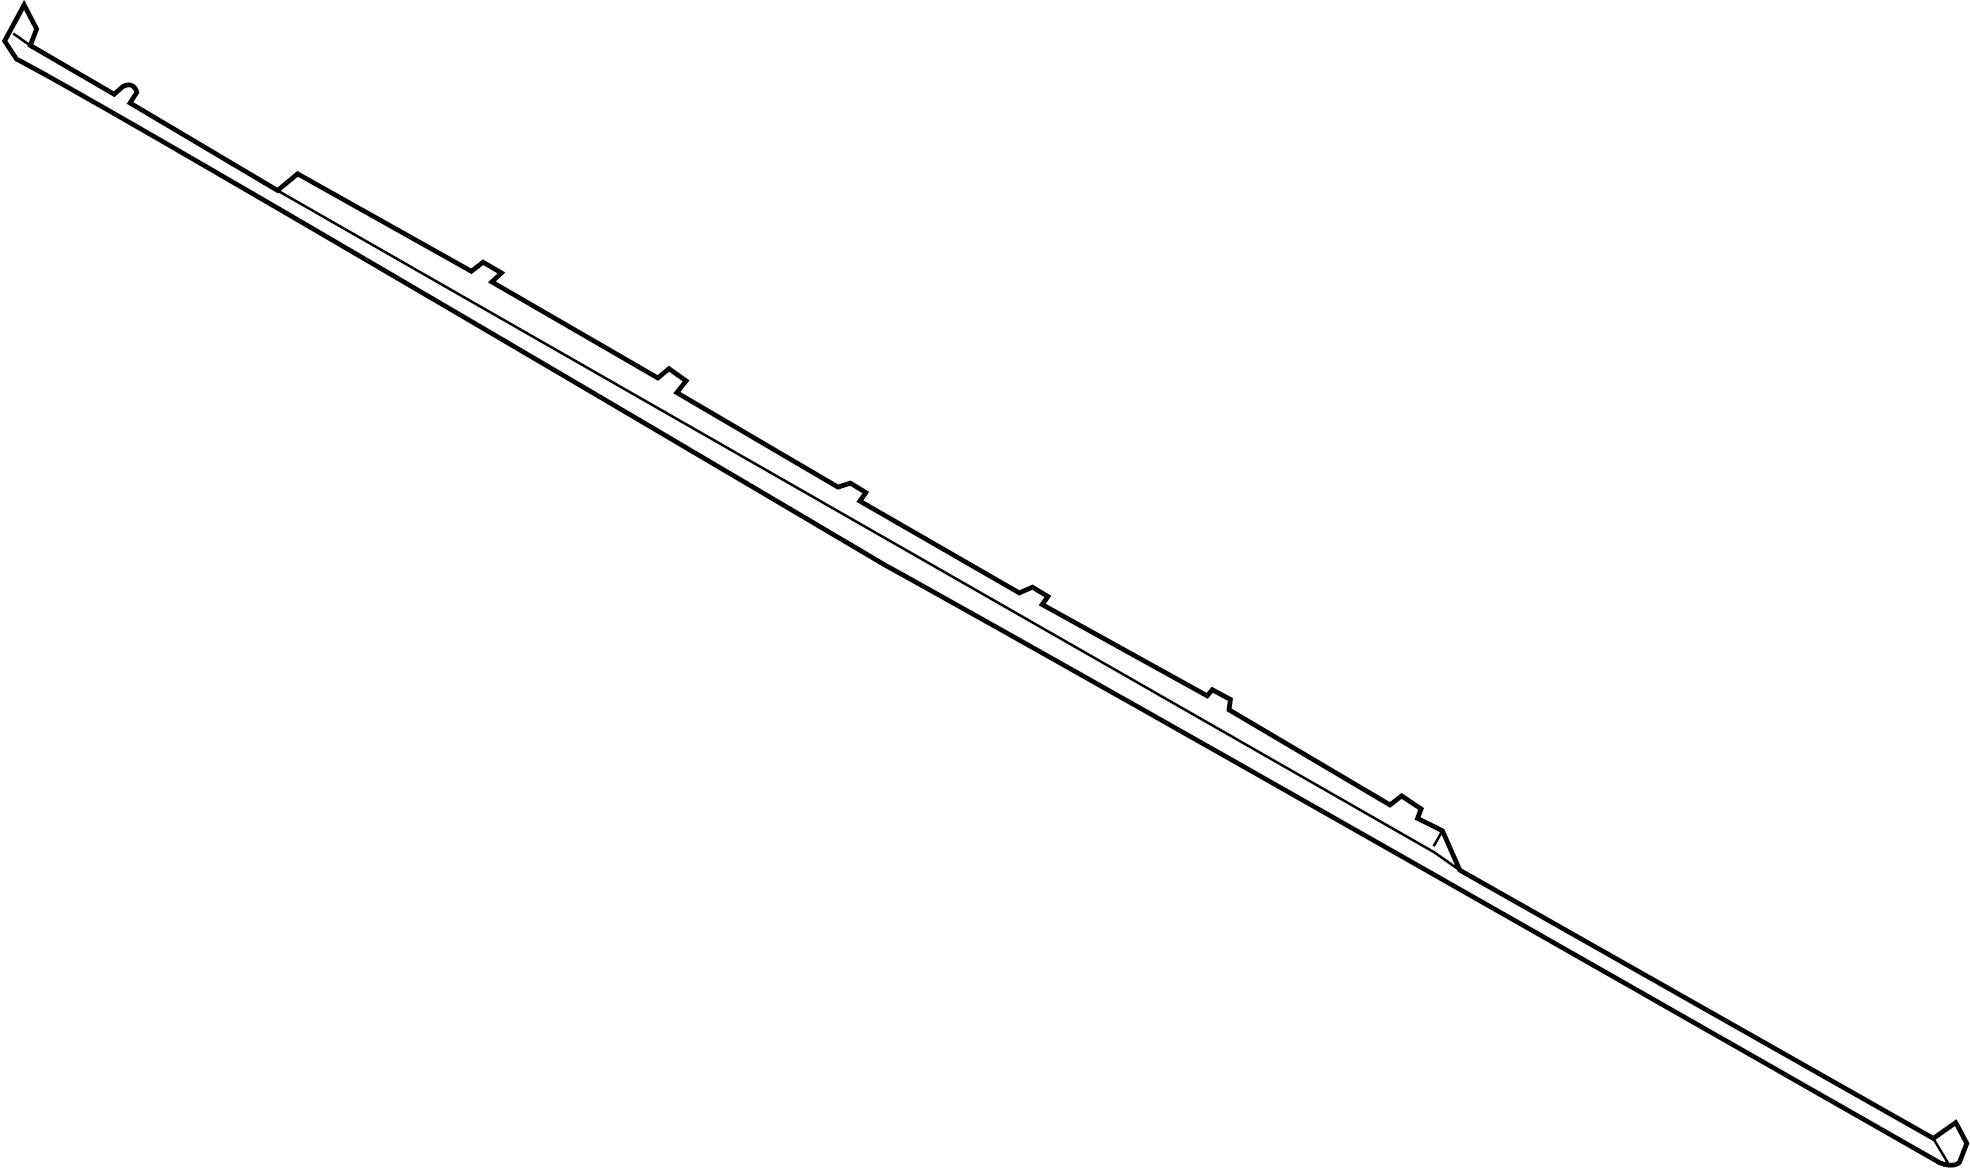 2010 Dodge Challenger Front Bumper Diagram